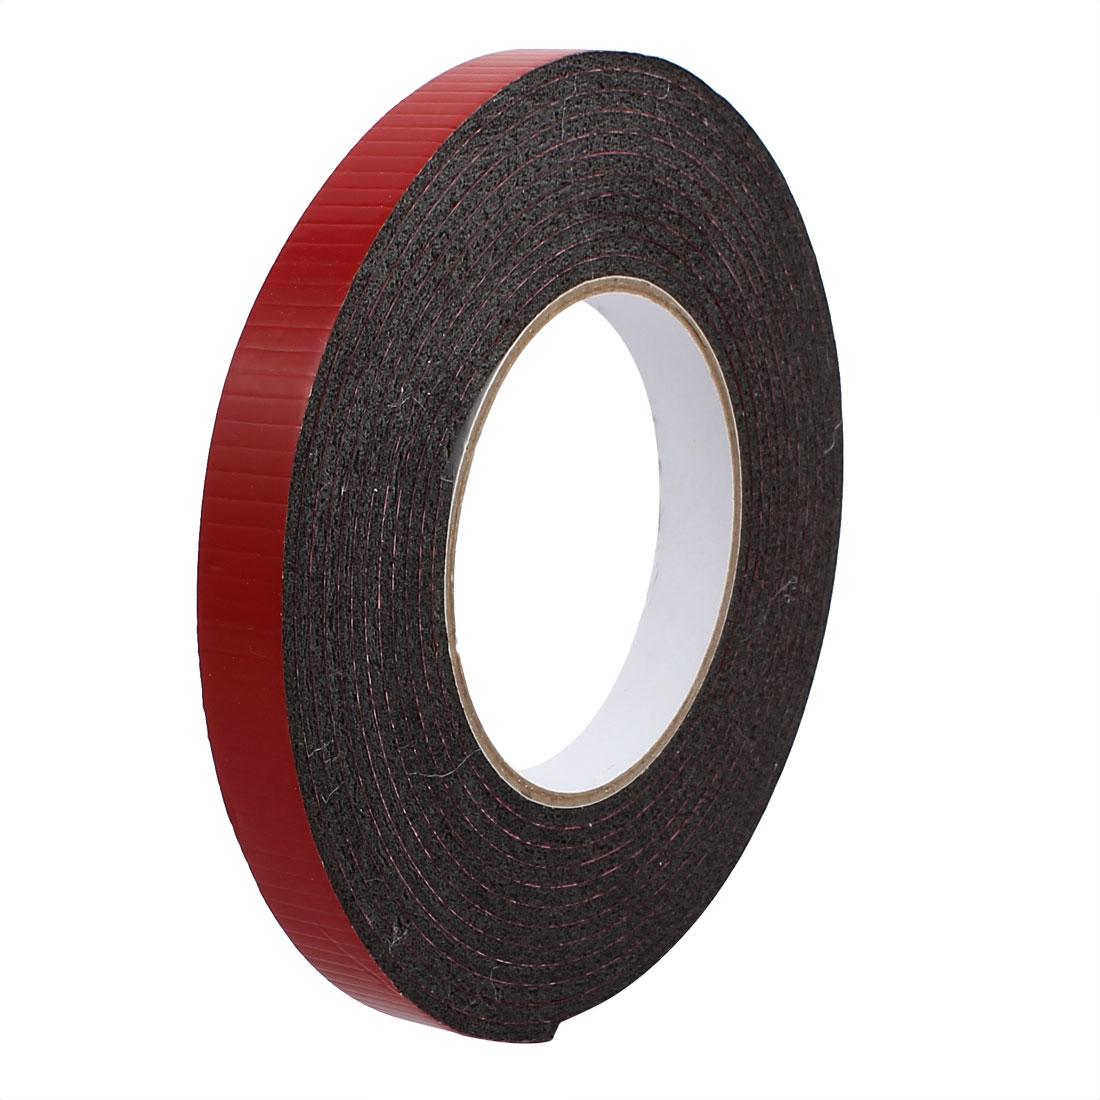 5M 15mm x 3mm Dual-side Adhesive Shockproof Sponge Foam Tape Red Black